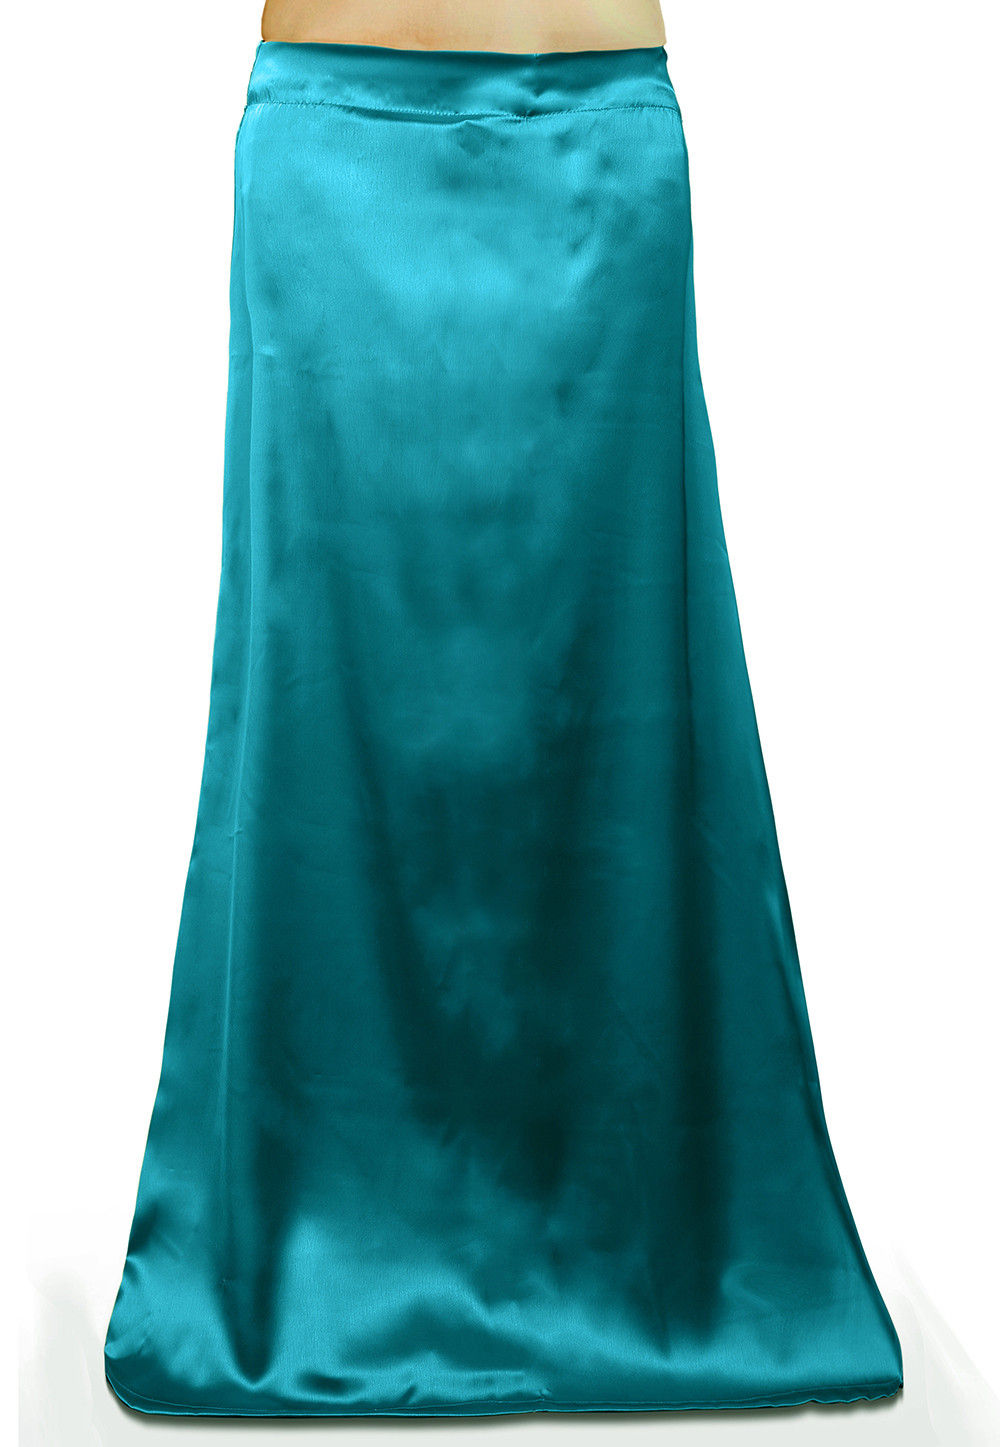 Satin Petticoat in Teal Blue